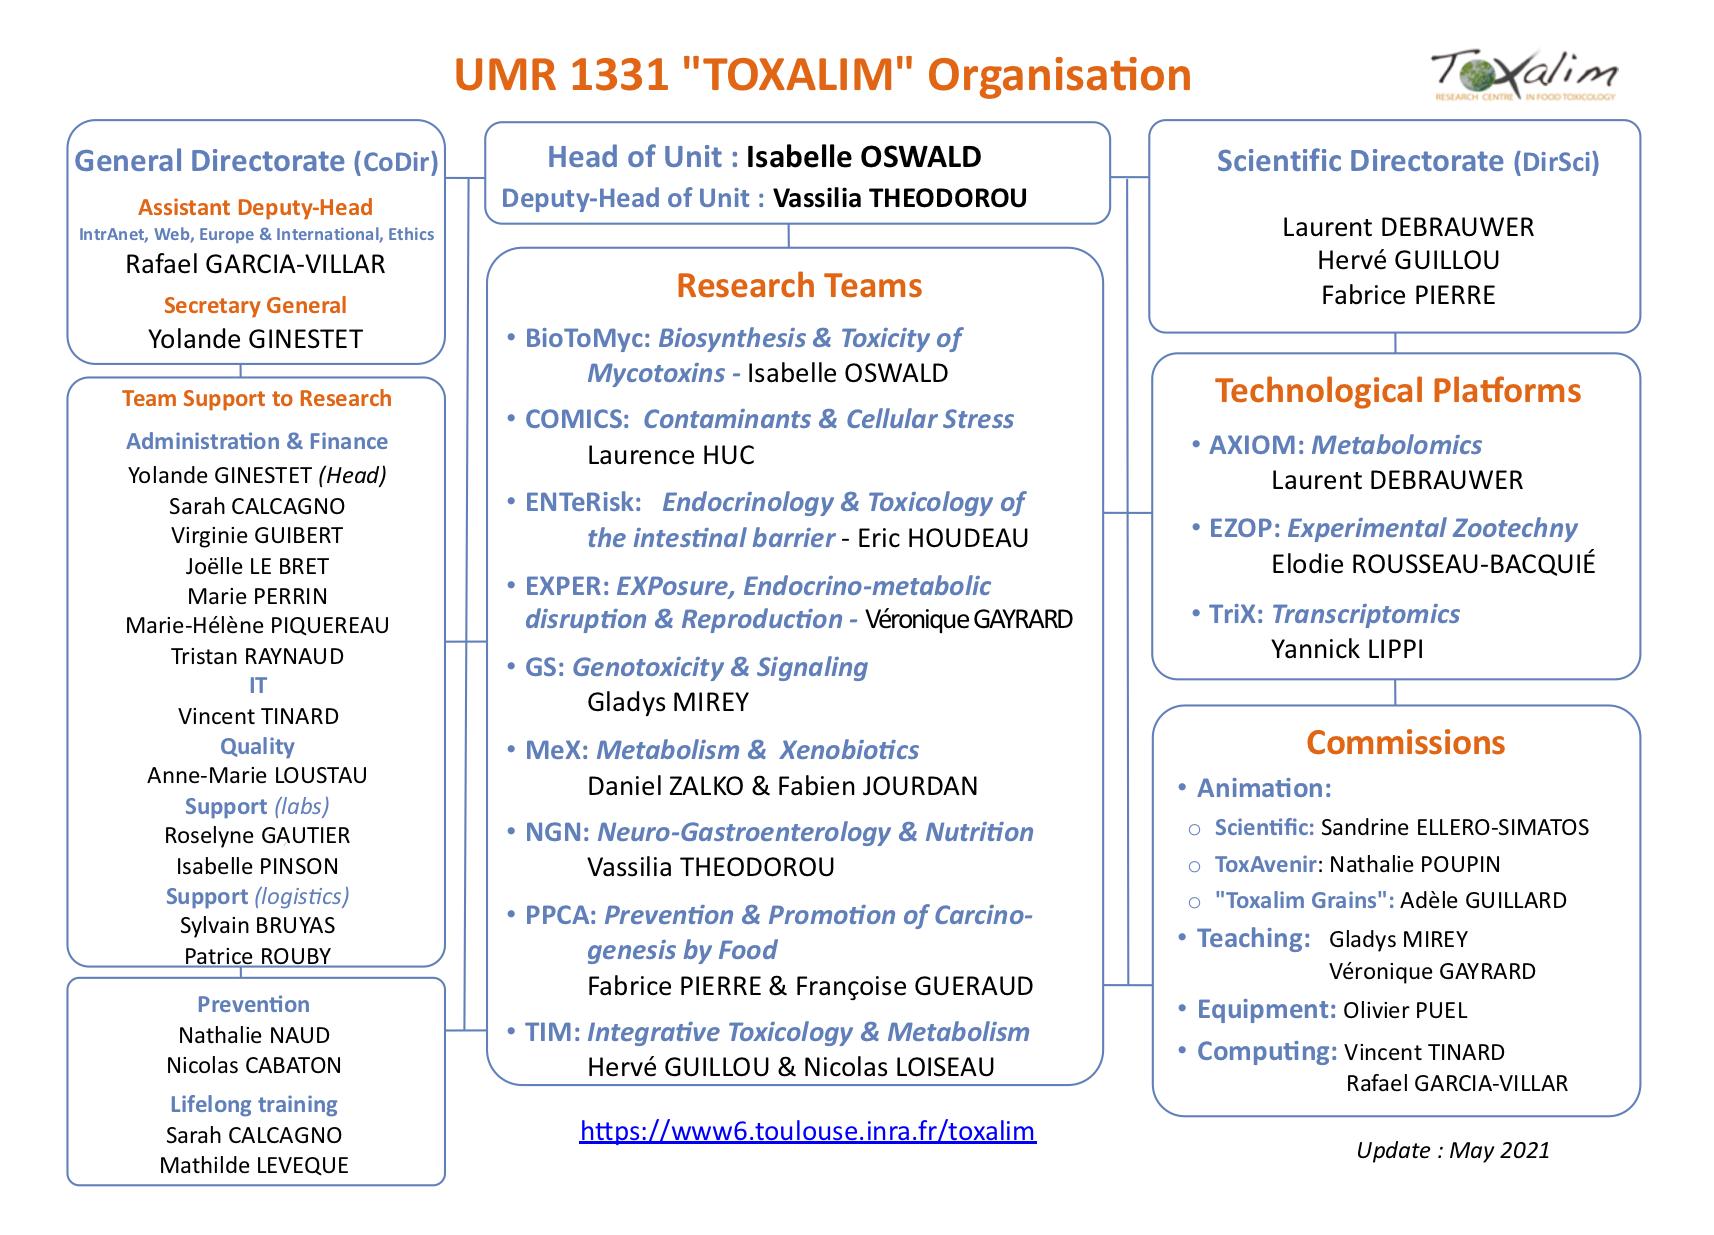 toxalim organisation flowchart_V17_202105